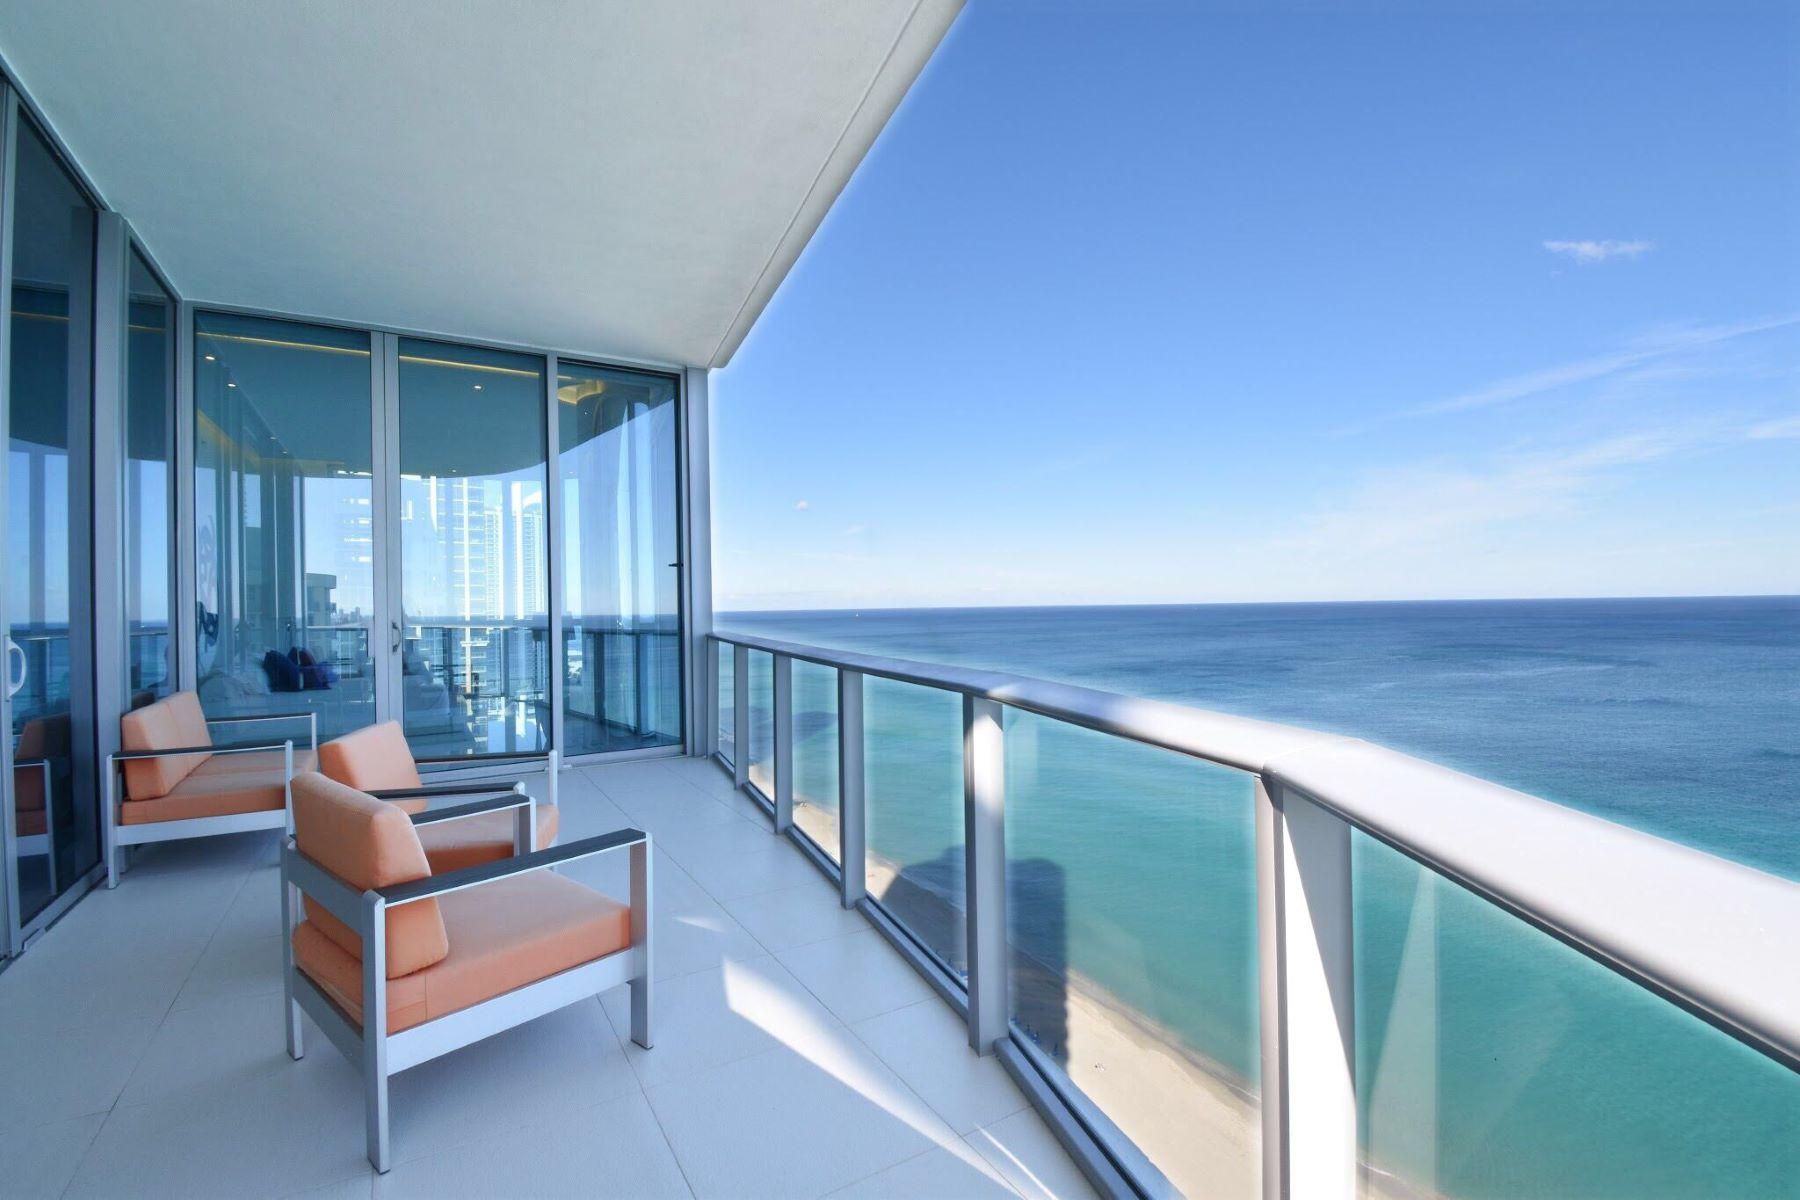 Condominium for Sale at 17475 Collins Av 17475 Collins Av 1901, Sunny Isles Beach, Florida, 33160 United States